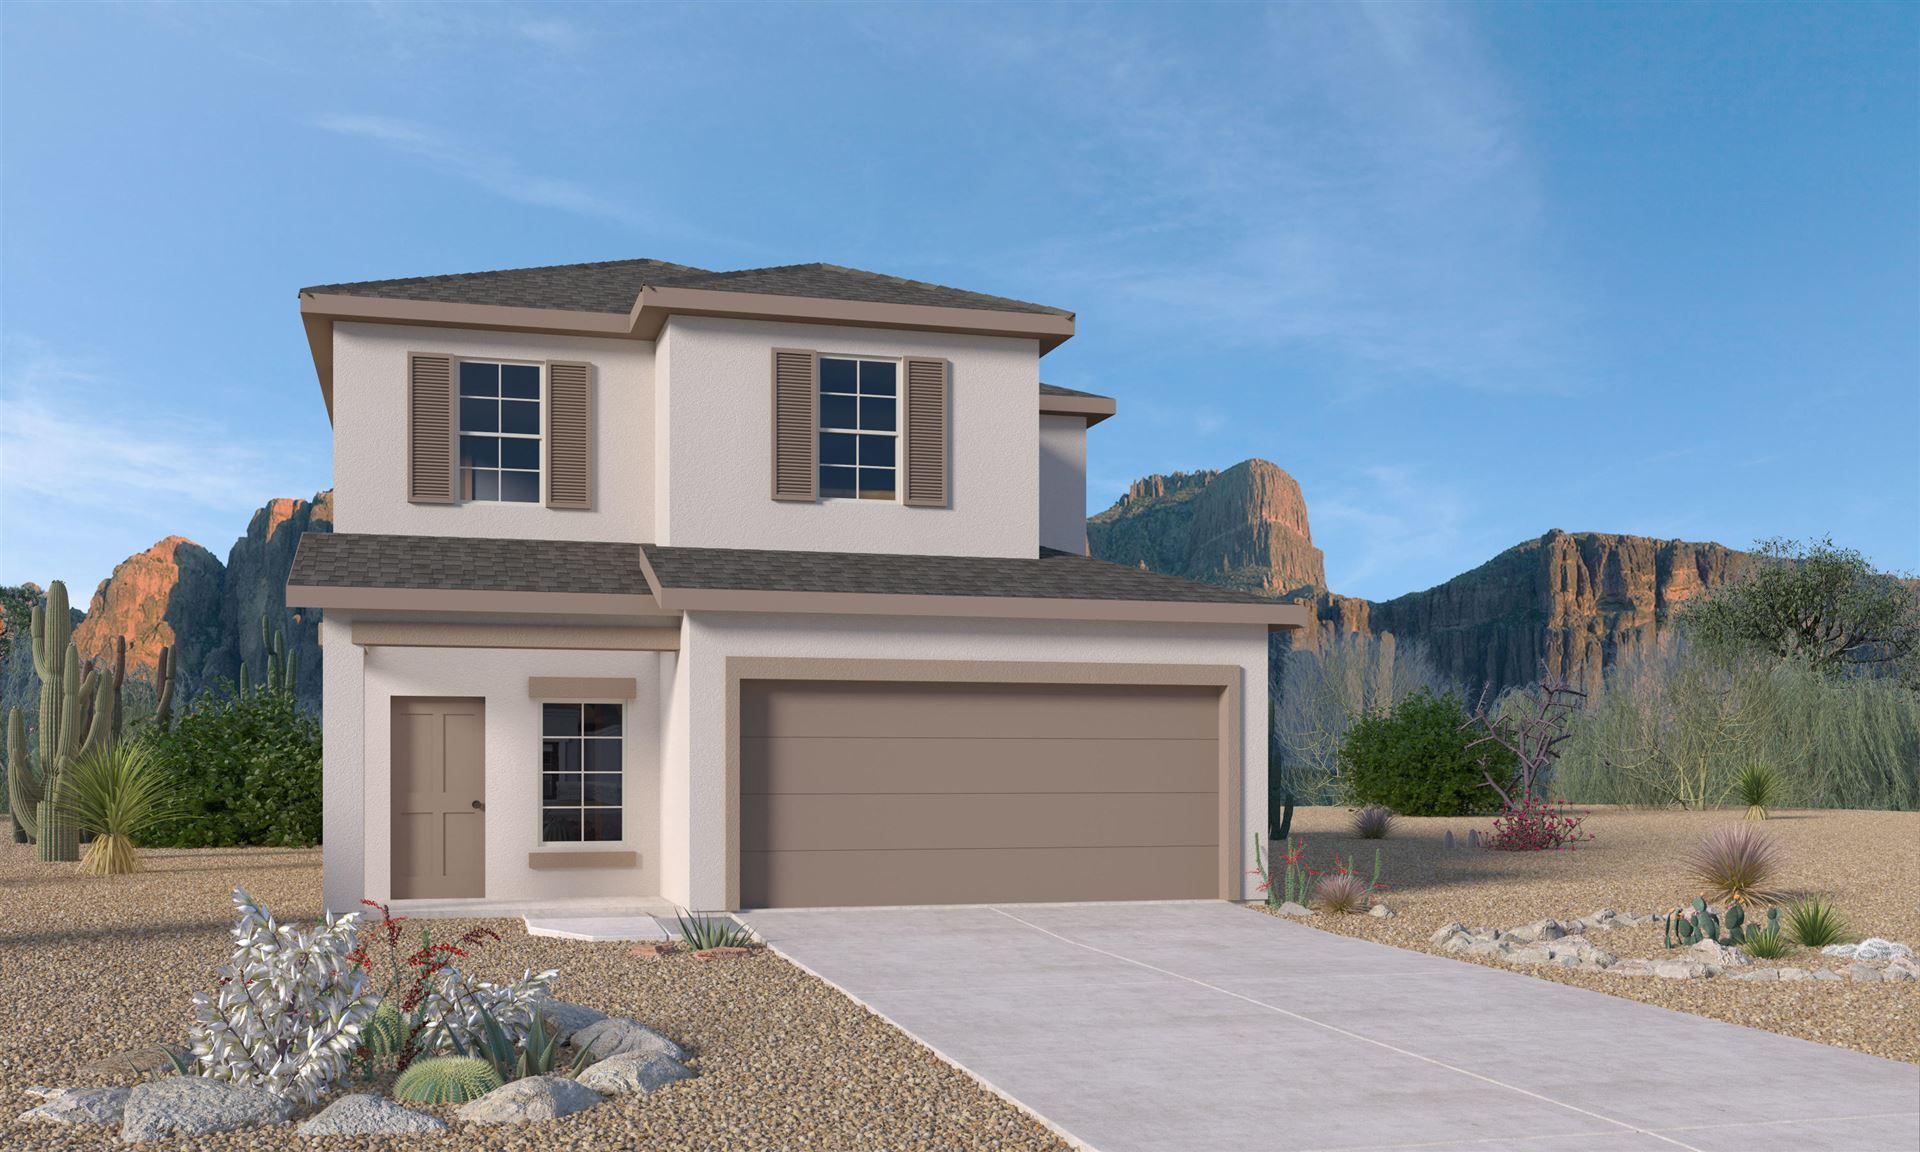 4840 Kings Peak Drive, Rio Rancho, NM 87144 - MLS#: 988882